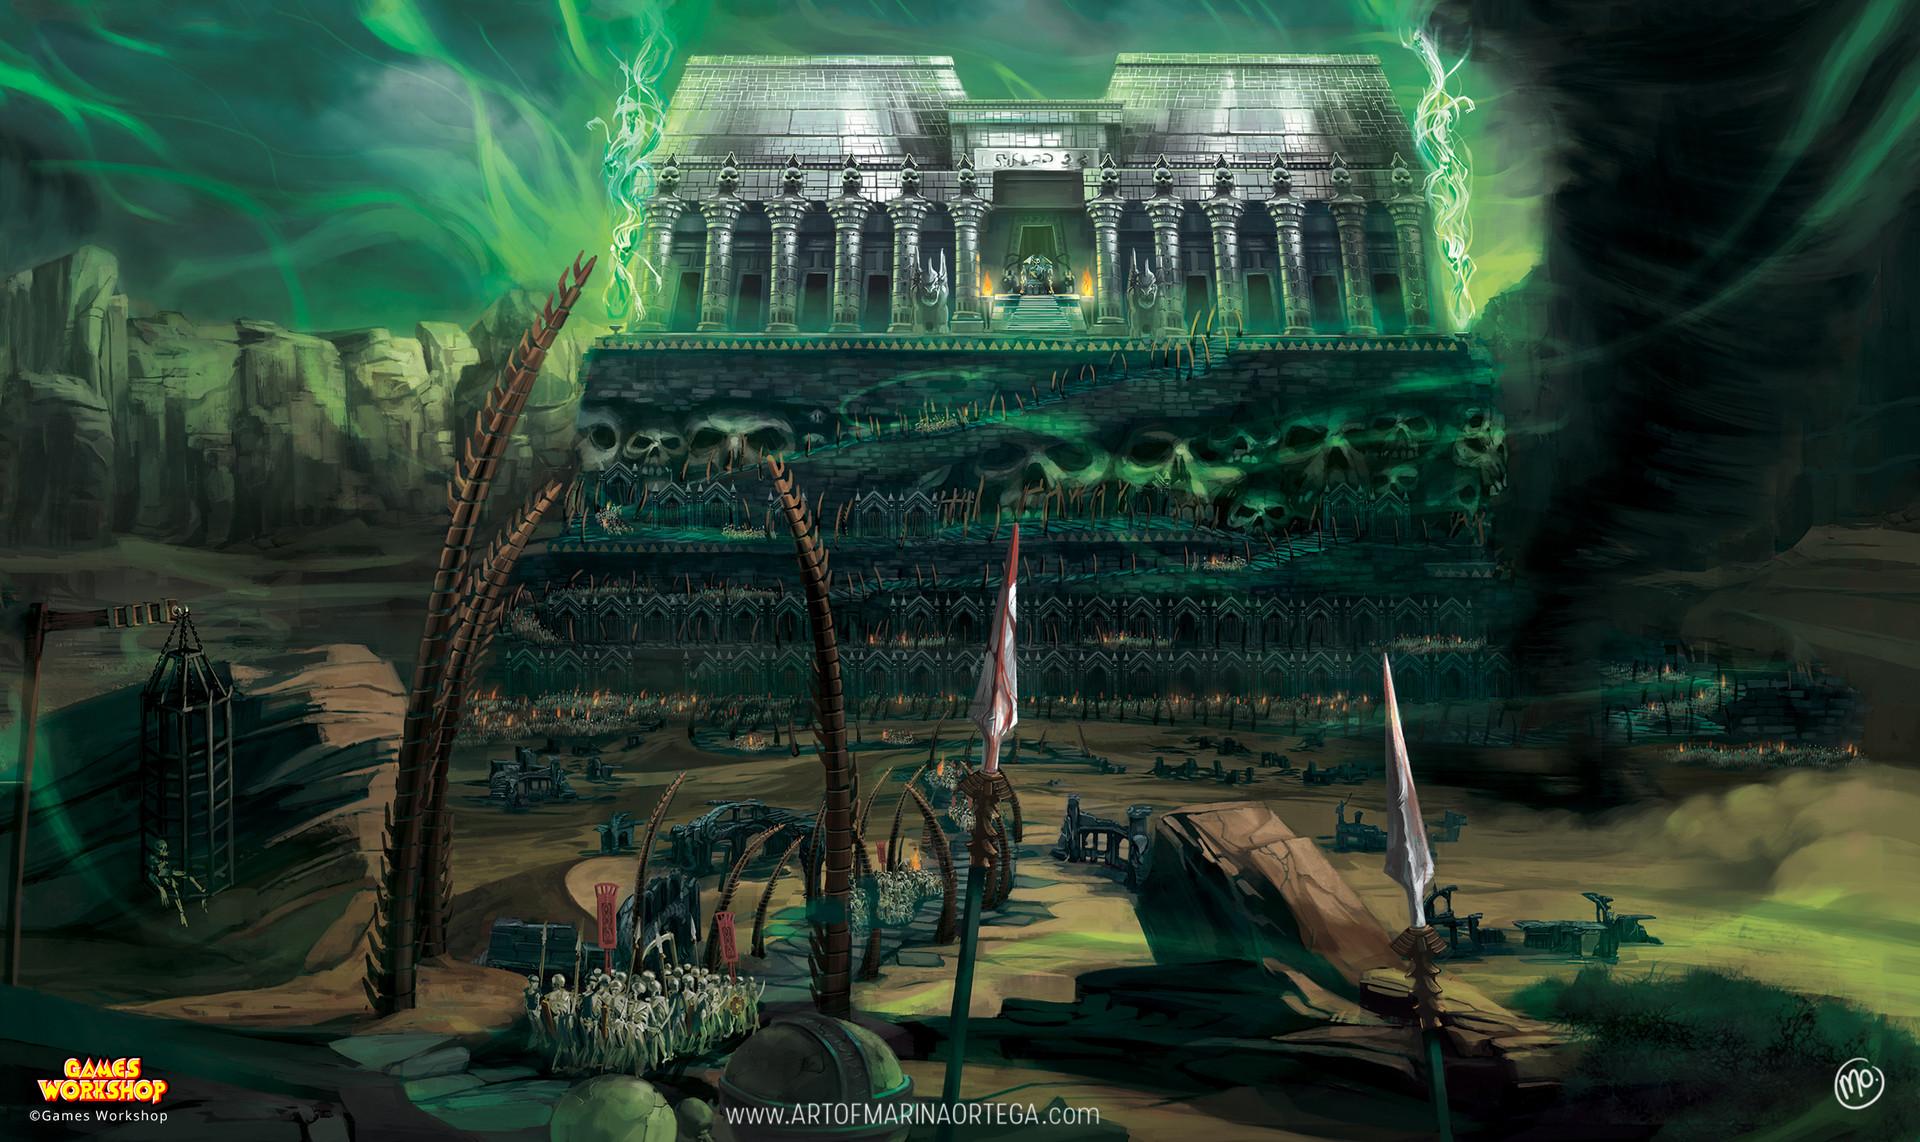 Marina ortega realm of death realmgate wars 2 balance of power www artofmarinaortega com marinaortega